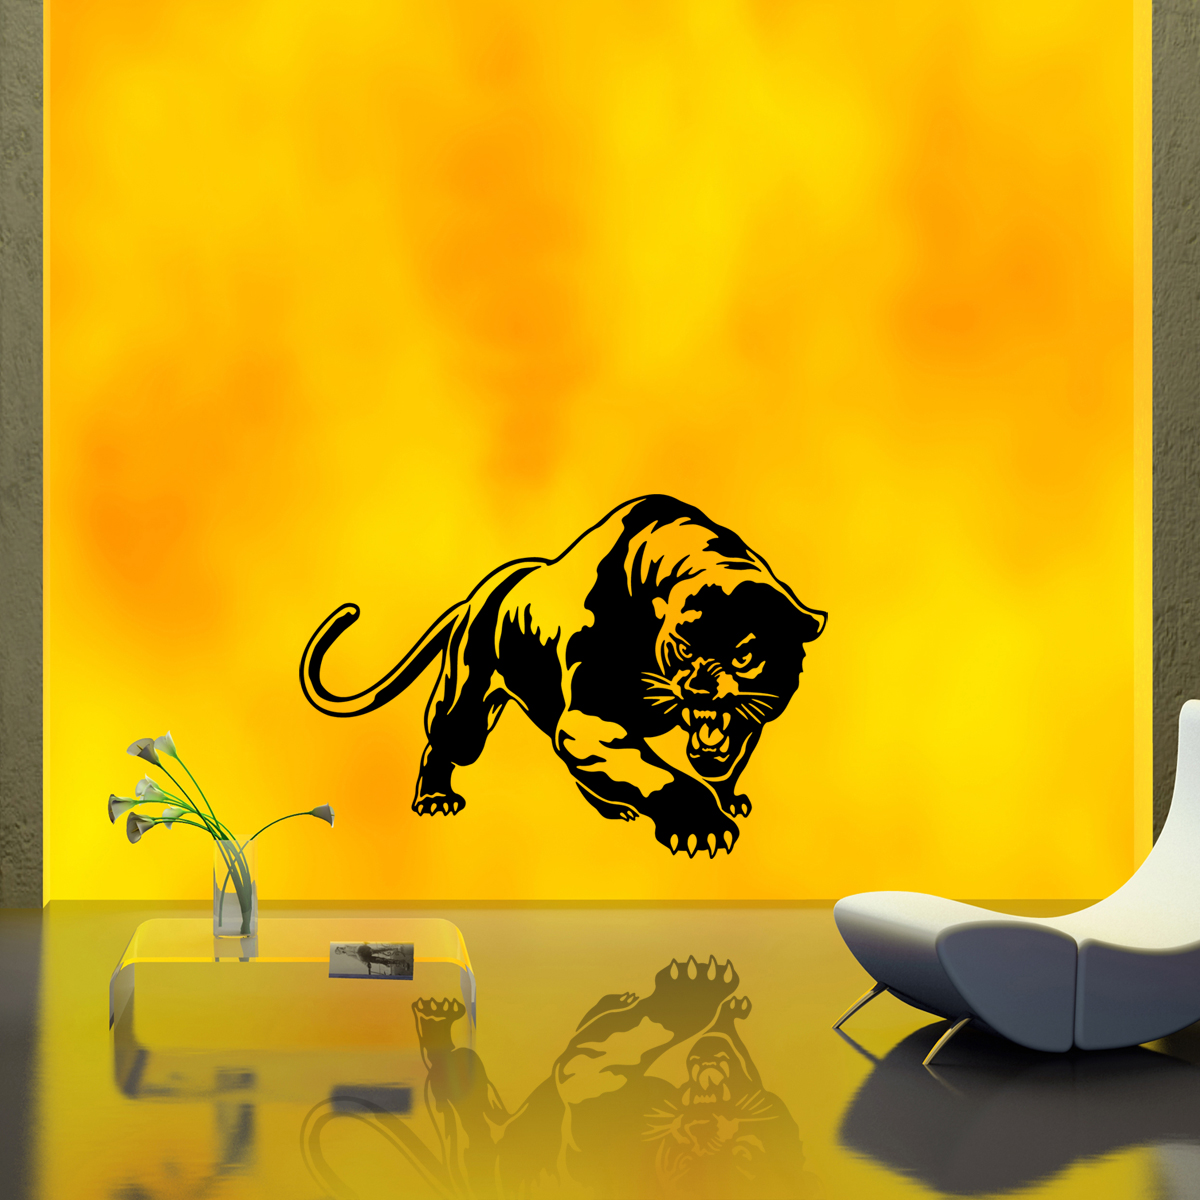 Sticker panthere hargneux 2 ambiance sticker ani panther.jpg